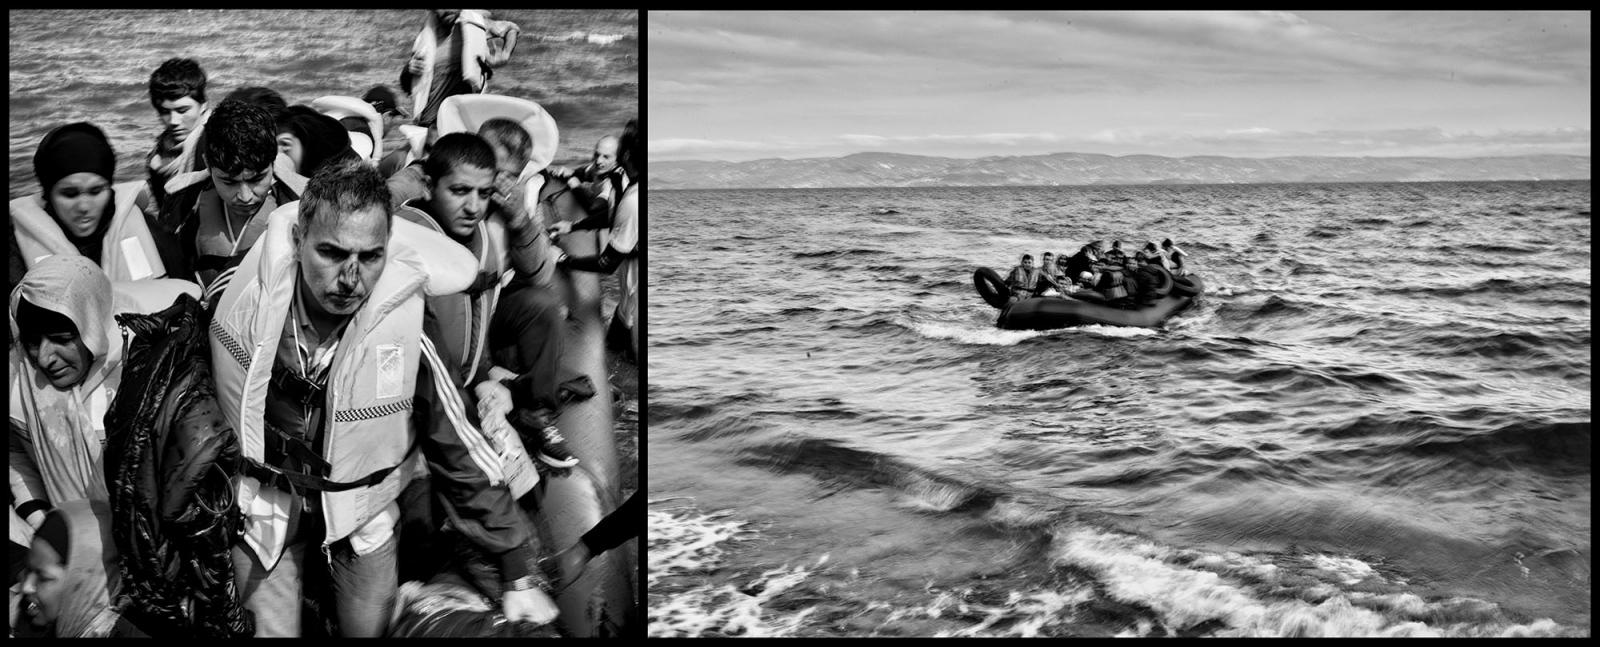 Art and Documentary Photography - Loading Nikos_Pilos_Stern_Goethe_institute_010.jpg